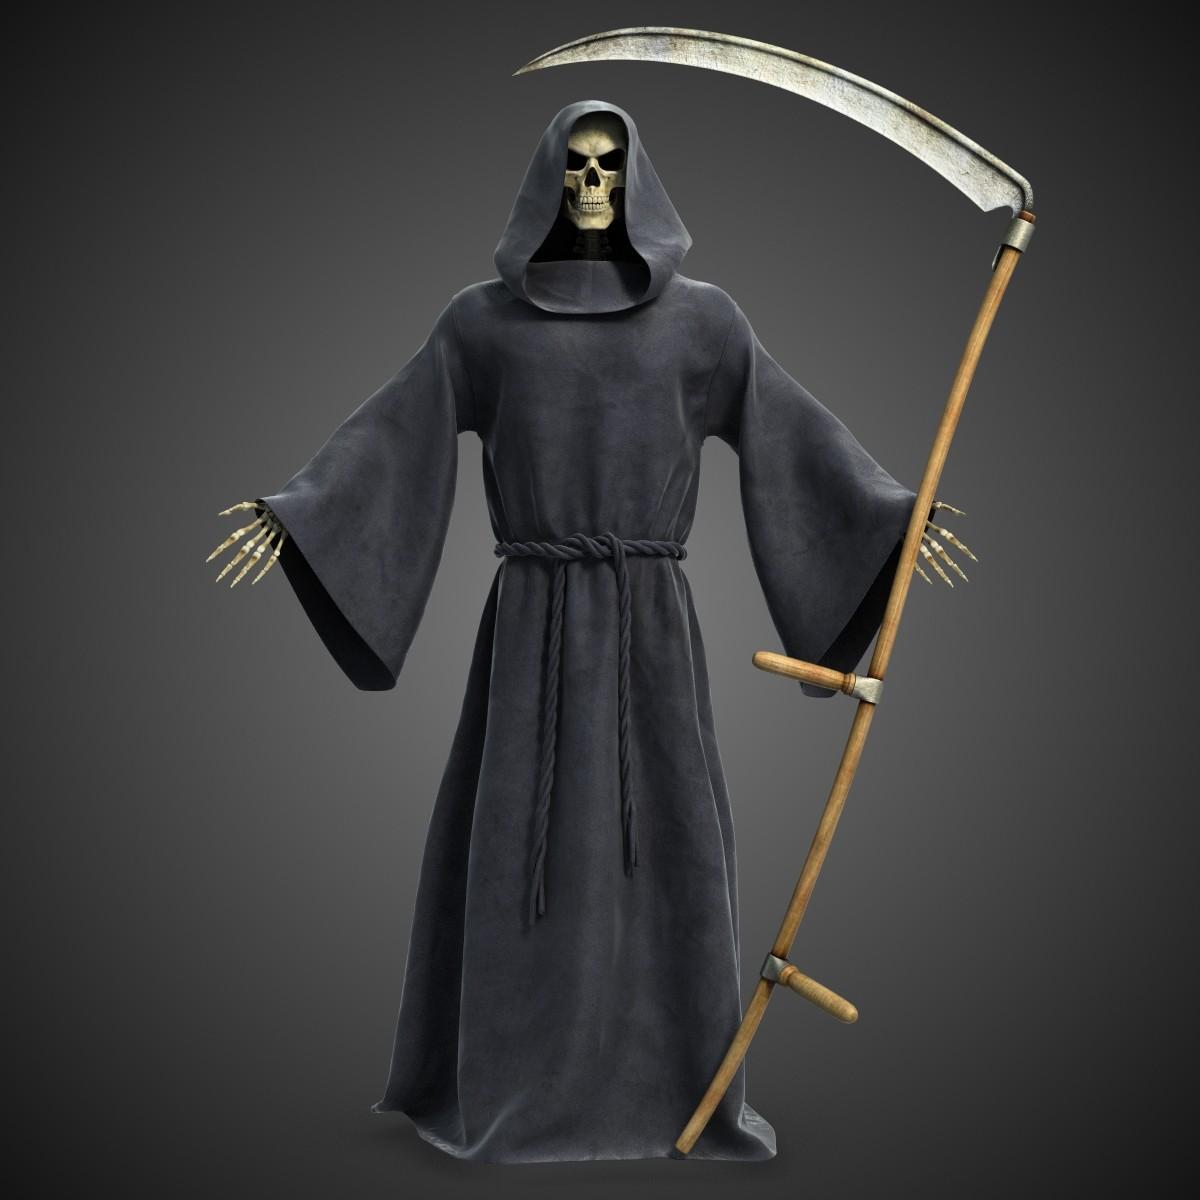 Death reaper with scythe 3d model best of 3d models Best 3d models